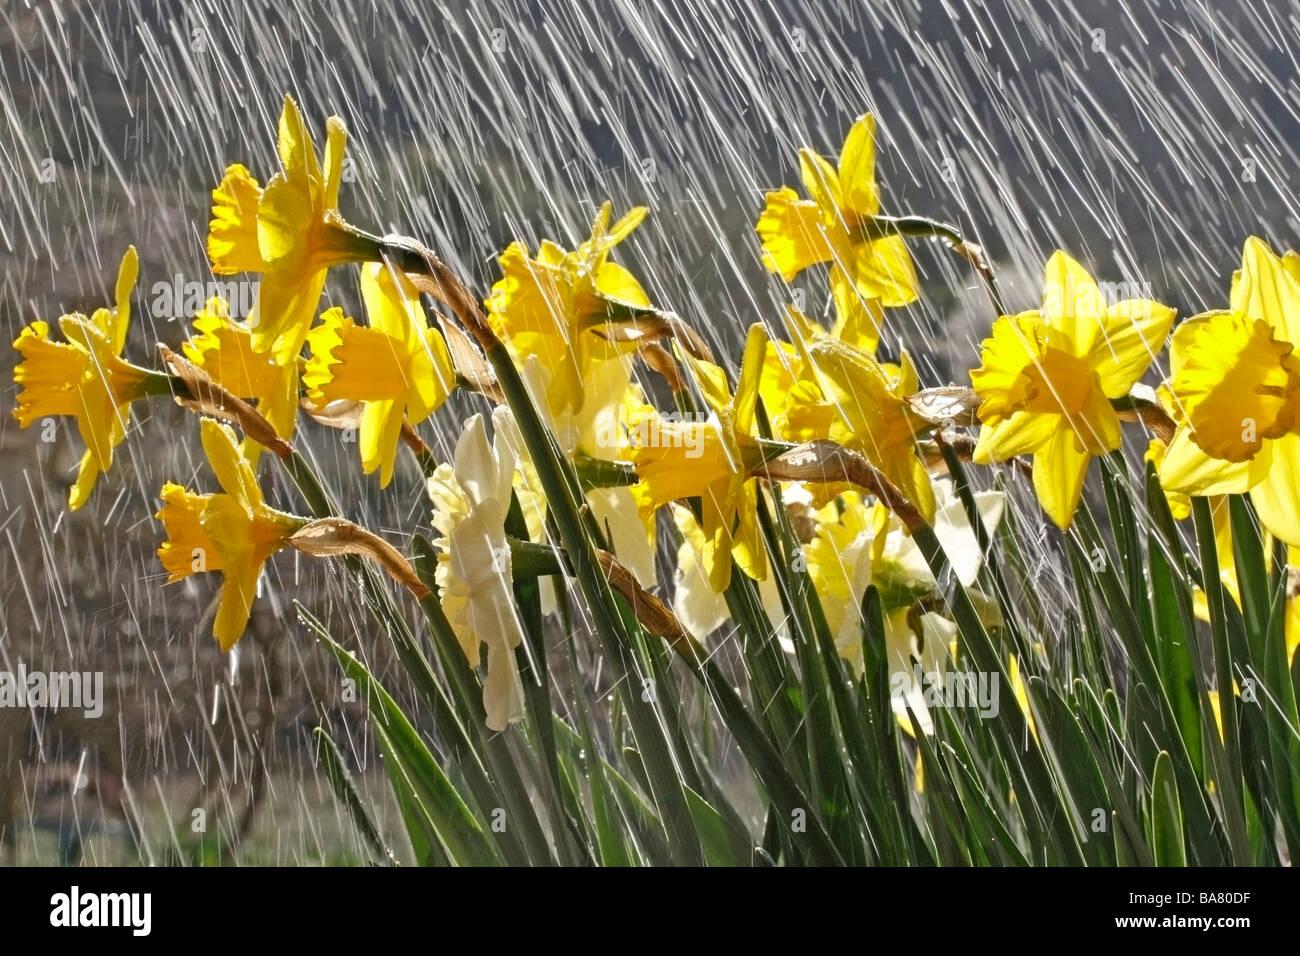 Daffodils and rain - Stock Image